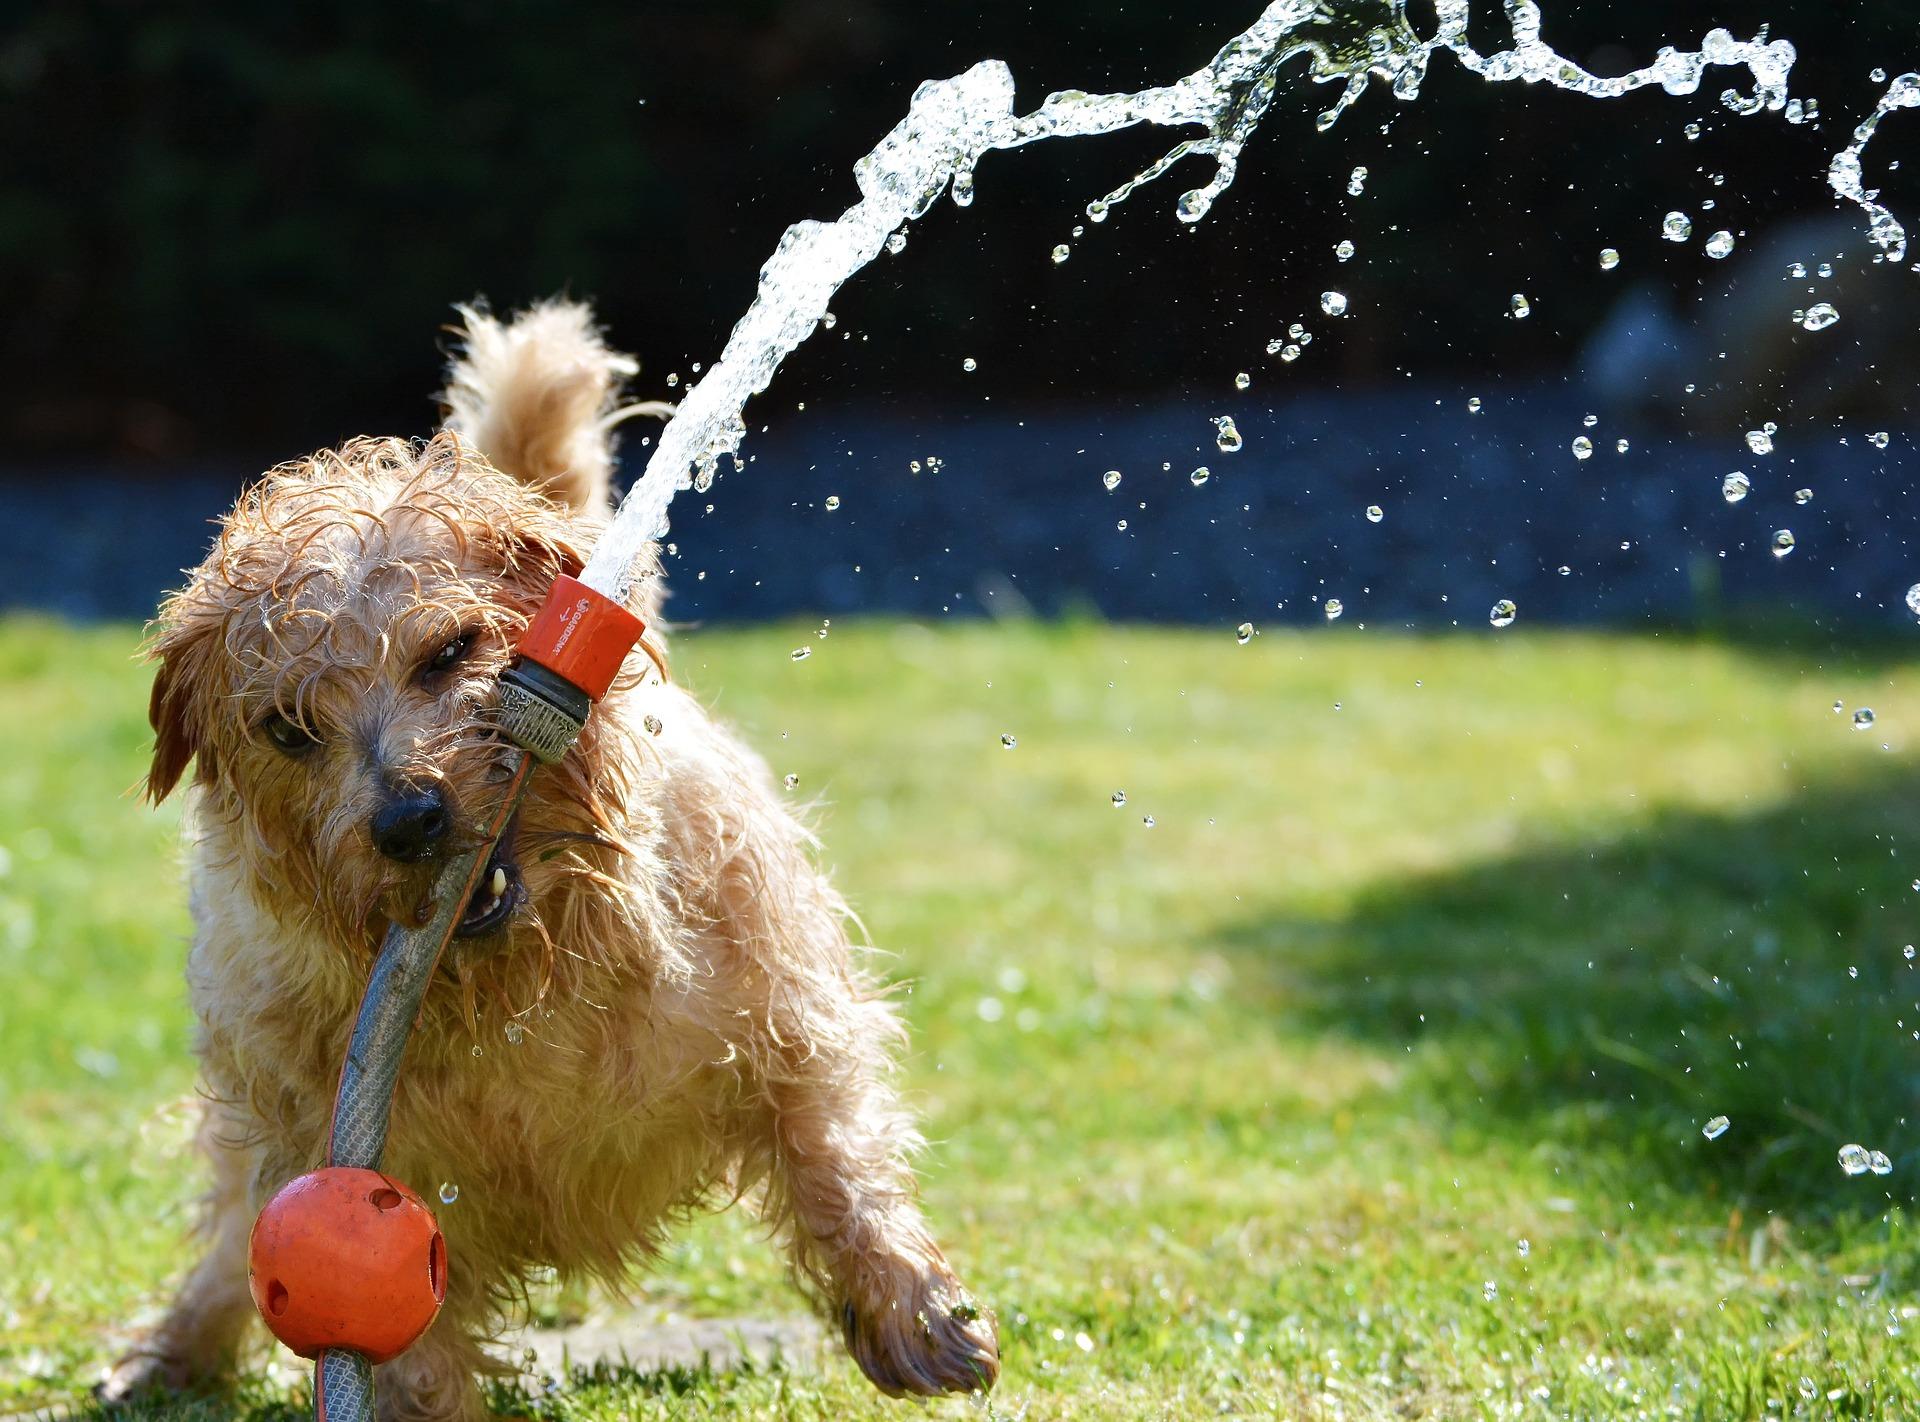 cane, Giardino, Terrier, divertimento, tubo flessibile - Sfondi HD - Professor-falken.com